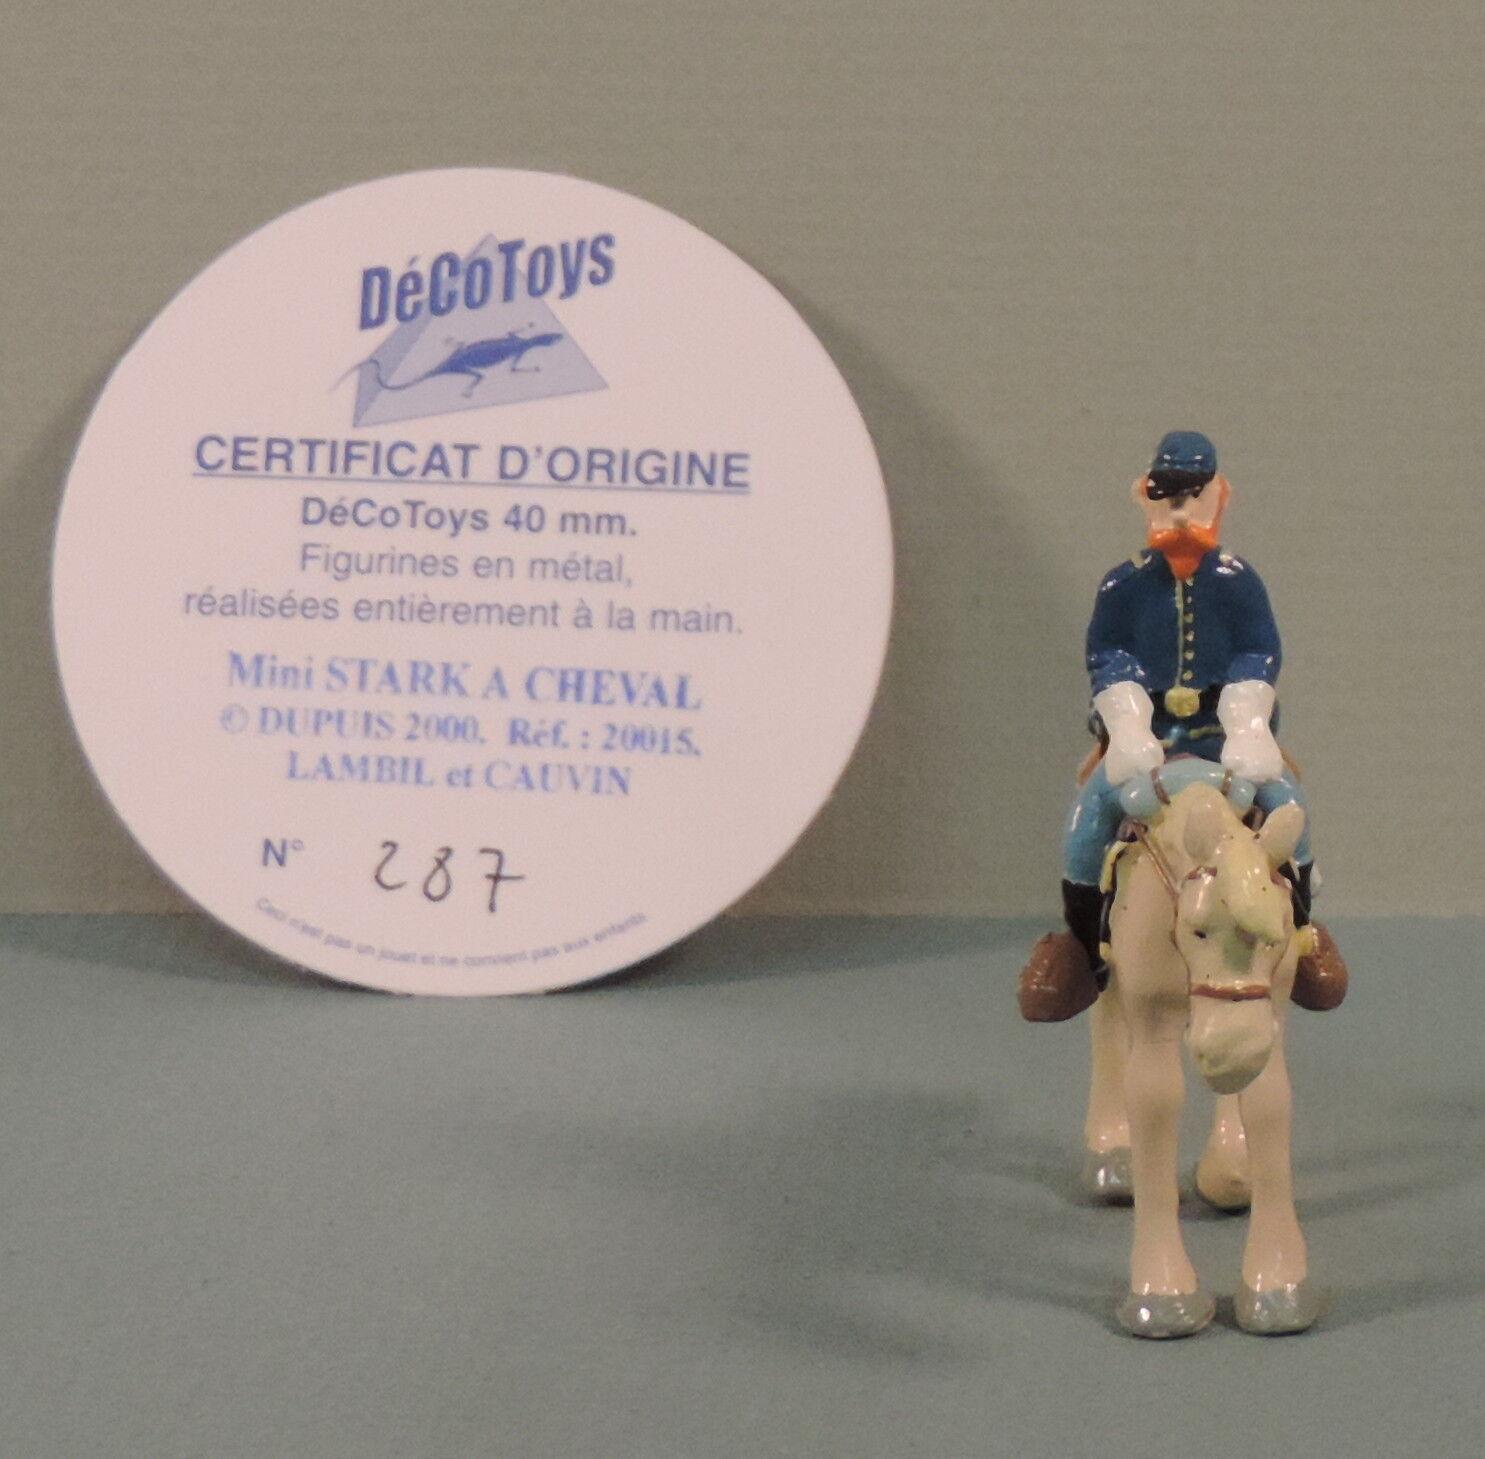 Tuniques bluees Stark a cheval mini statuette metal Decotoys 20015 numerede